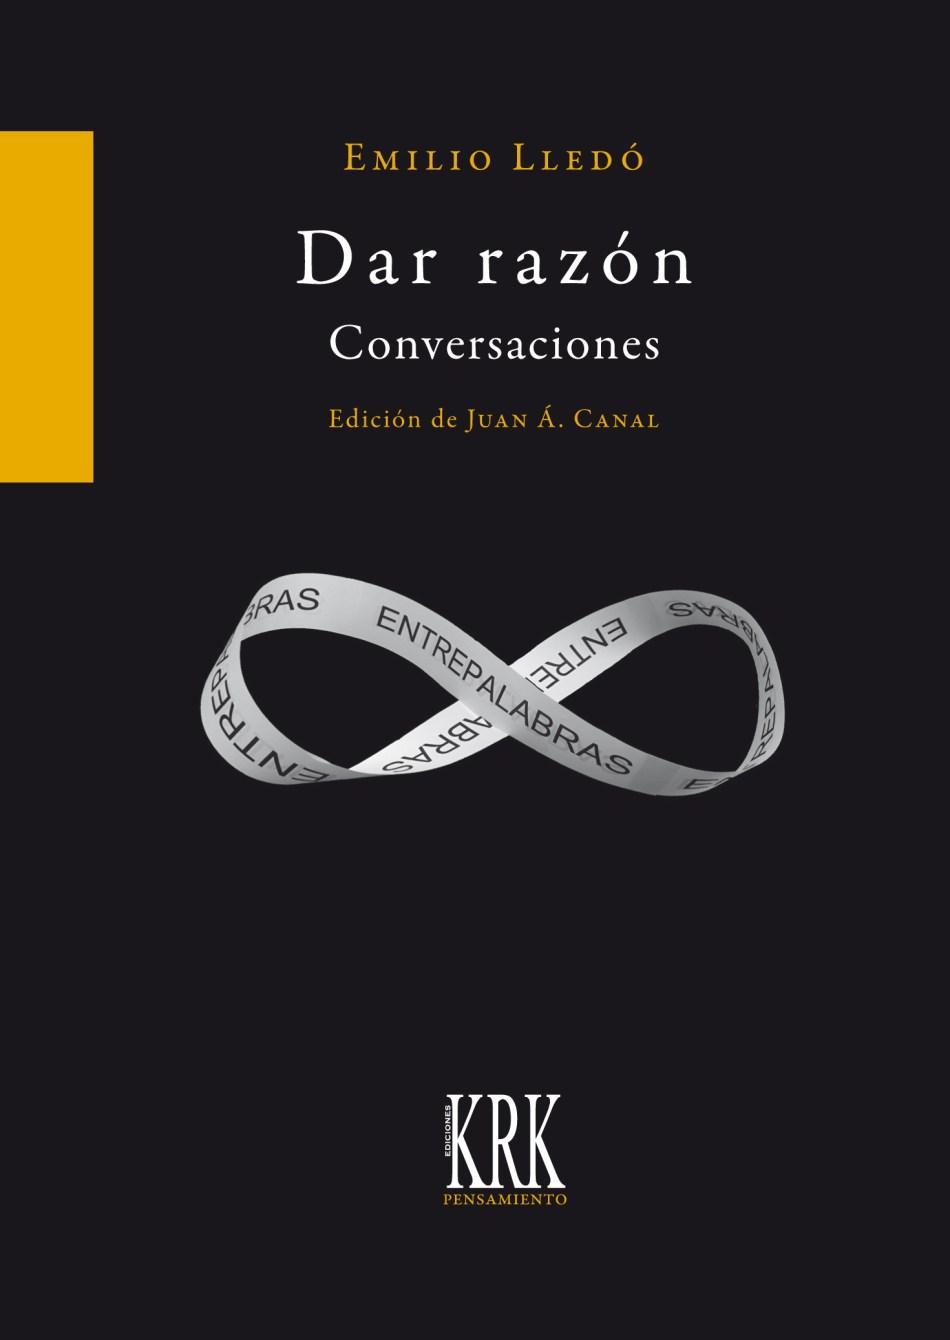 tapa_lledo_darrazon.indd